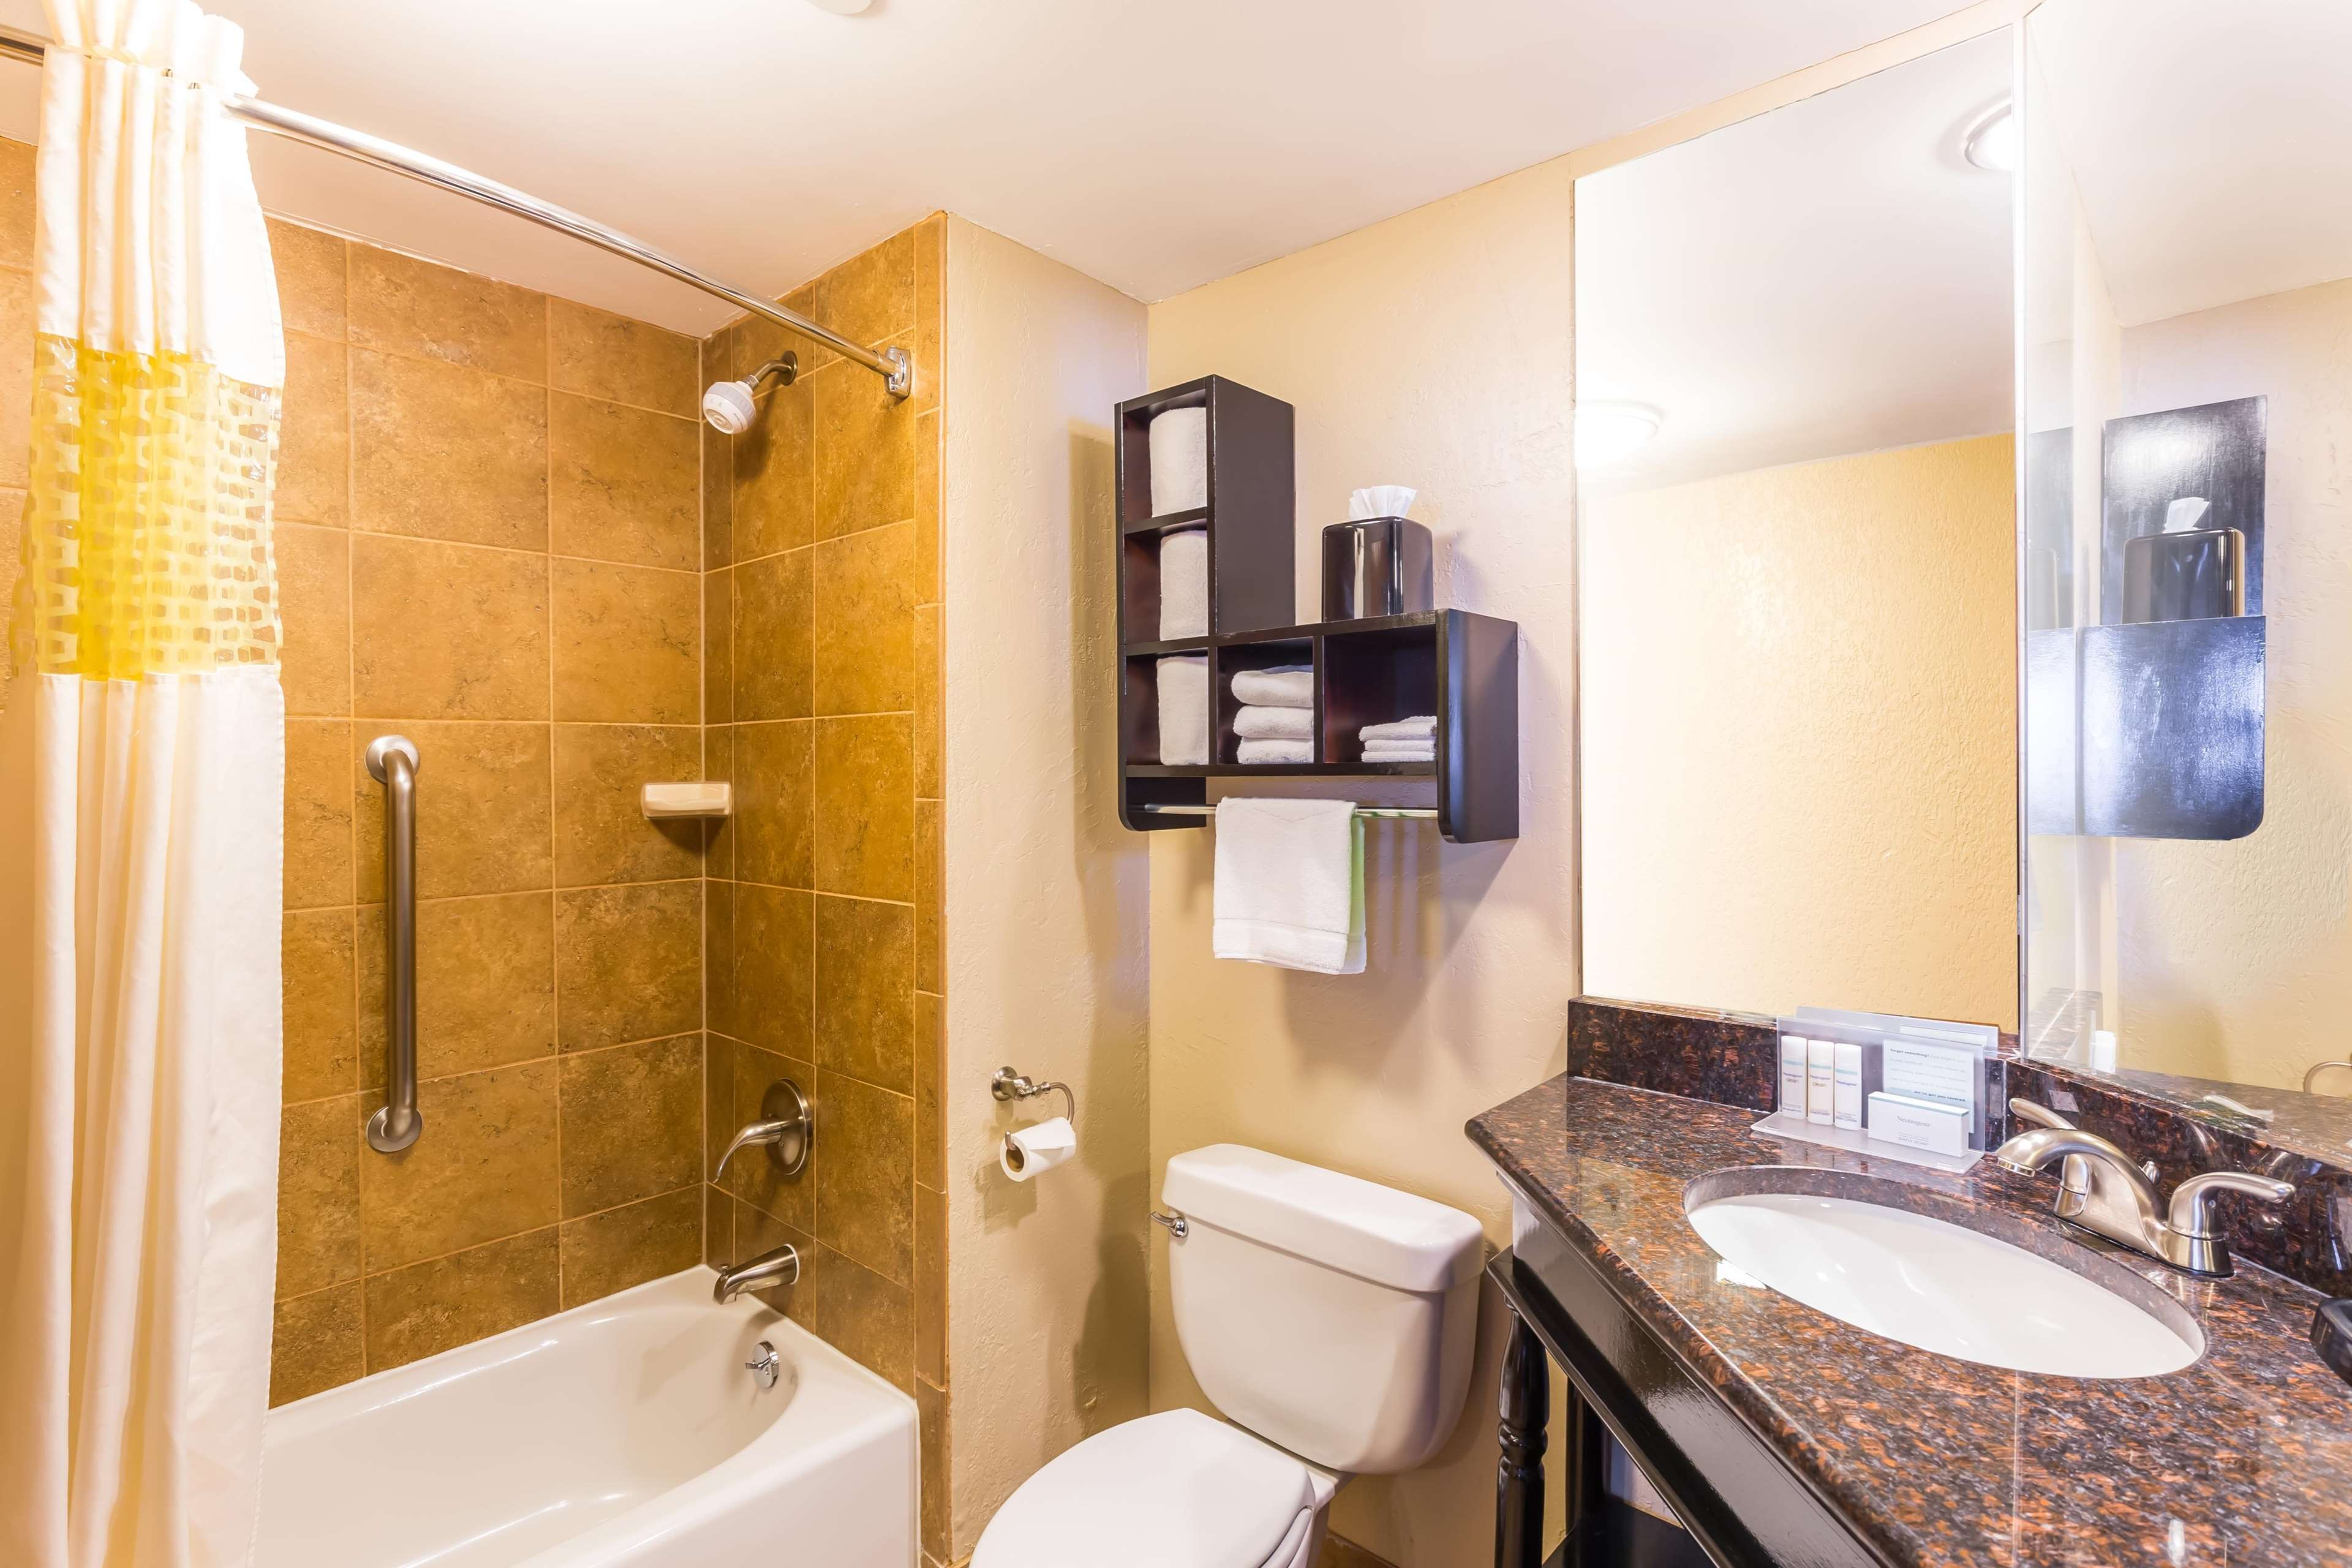 Hampton Inn & Suites Chicago/Hoffman Estates image 47